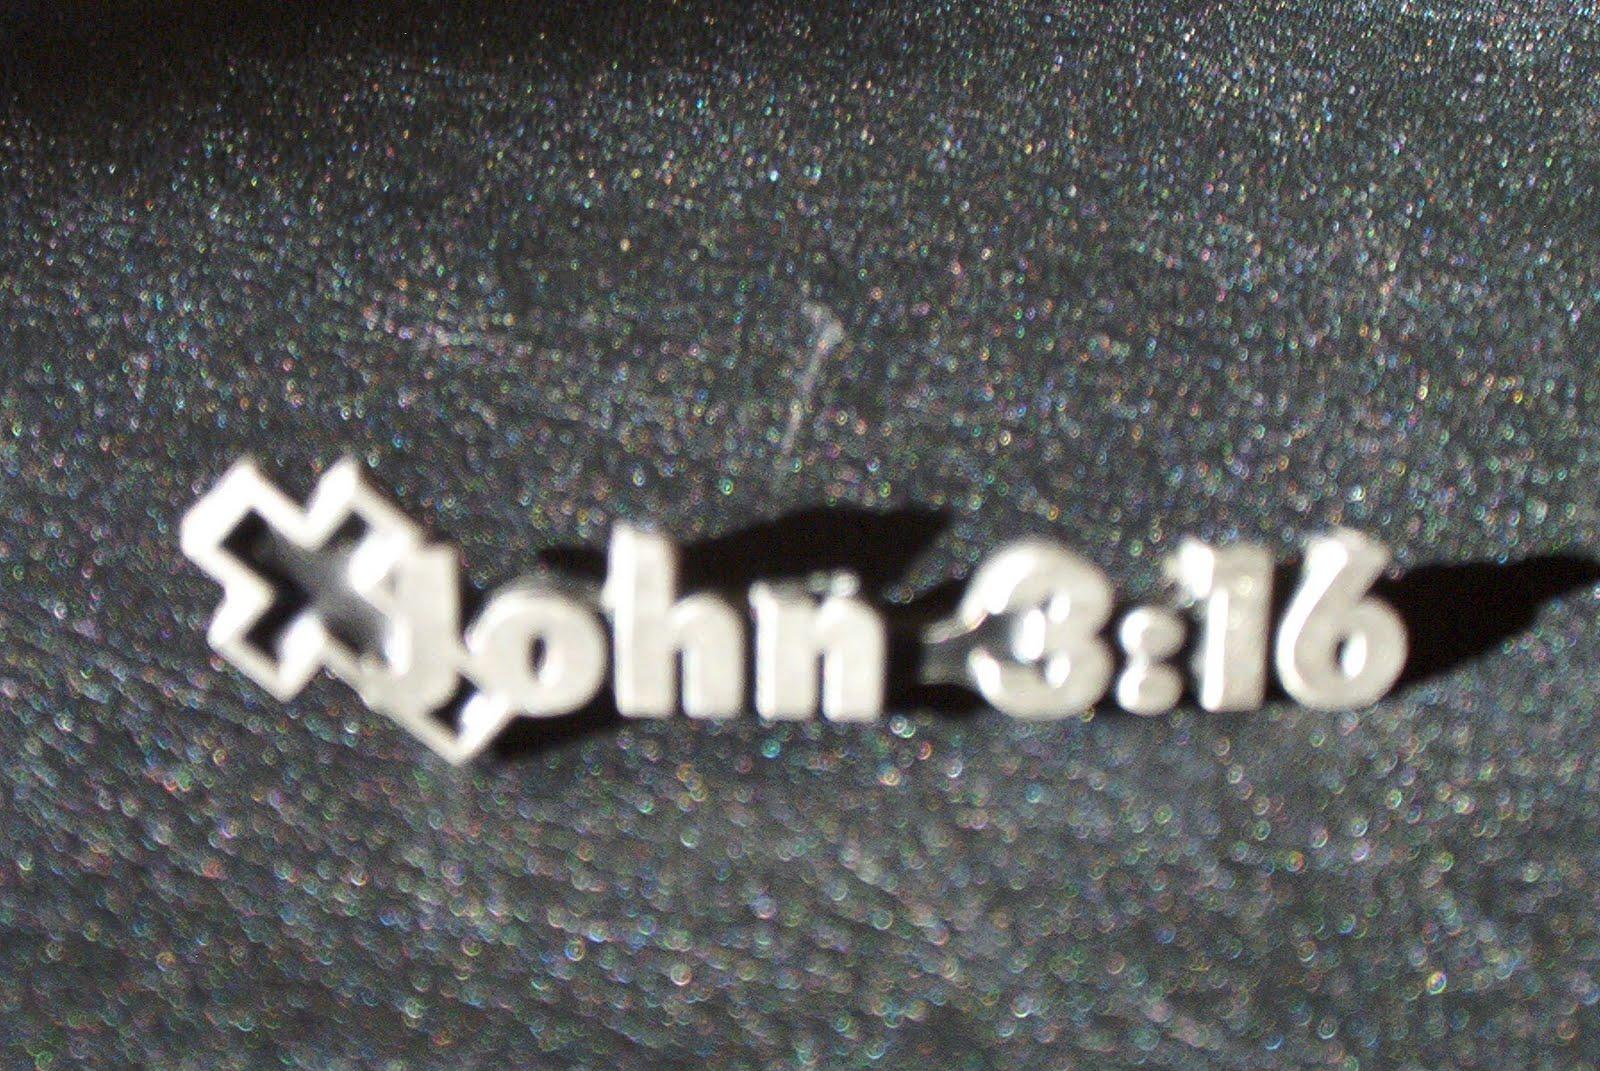 http://2.bp.blogspot.com/_2Ks_Im1Ni8c/TSM89sOmhkI/AAAAAAAACbk/b4VANMLgadk/s1600/john-3_16_Bible-Quote_Wallpaper.jpg